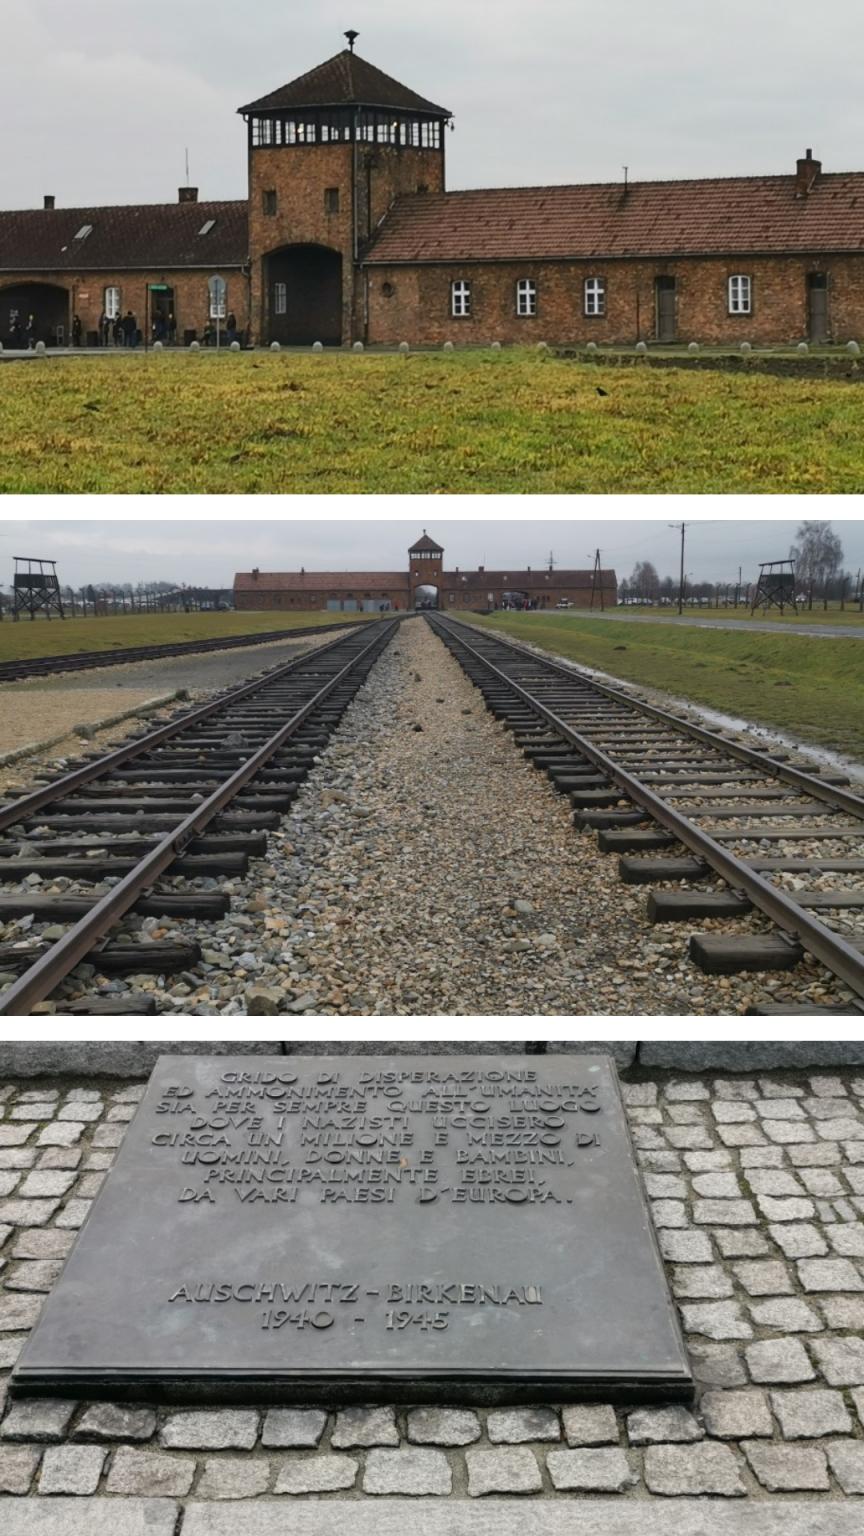 Da Cracovia a Auschwitz - Birkenau, la nostra esperienza.